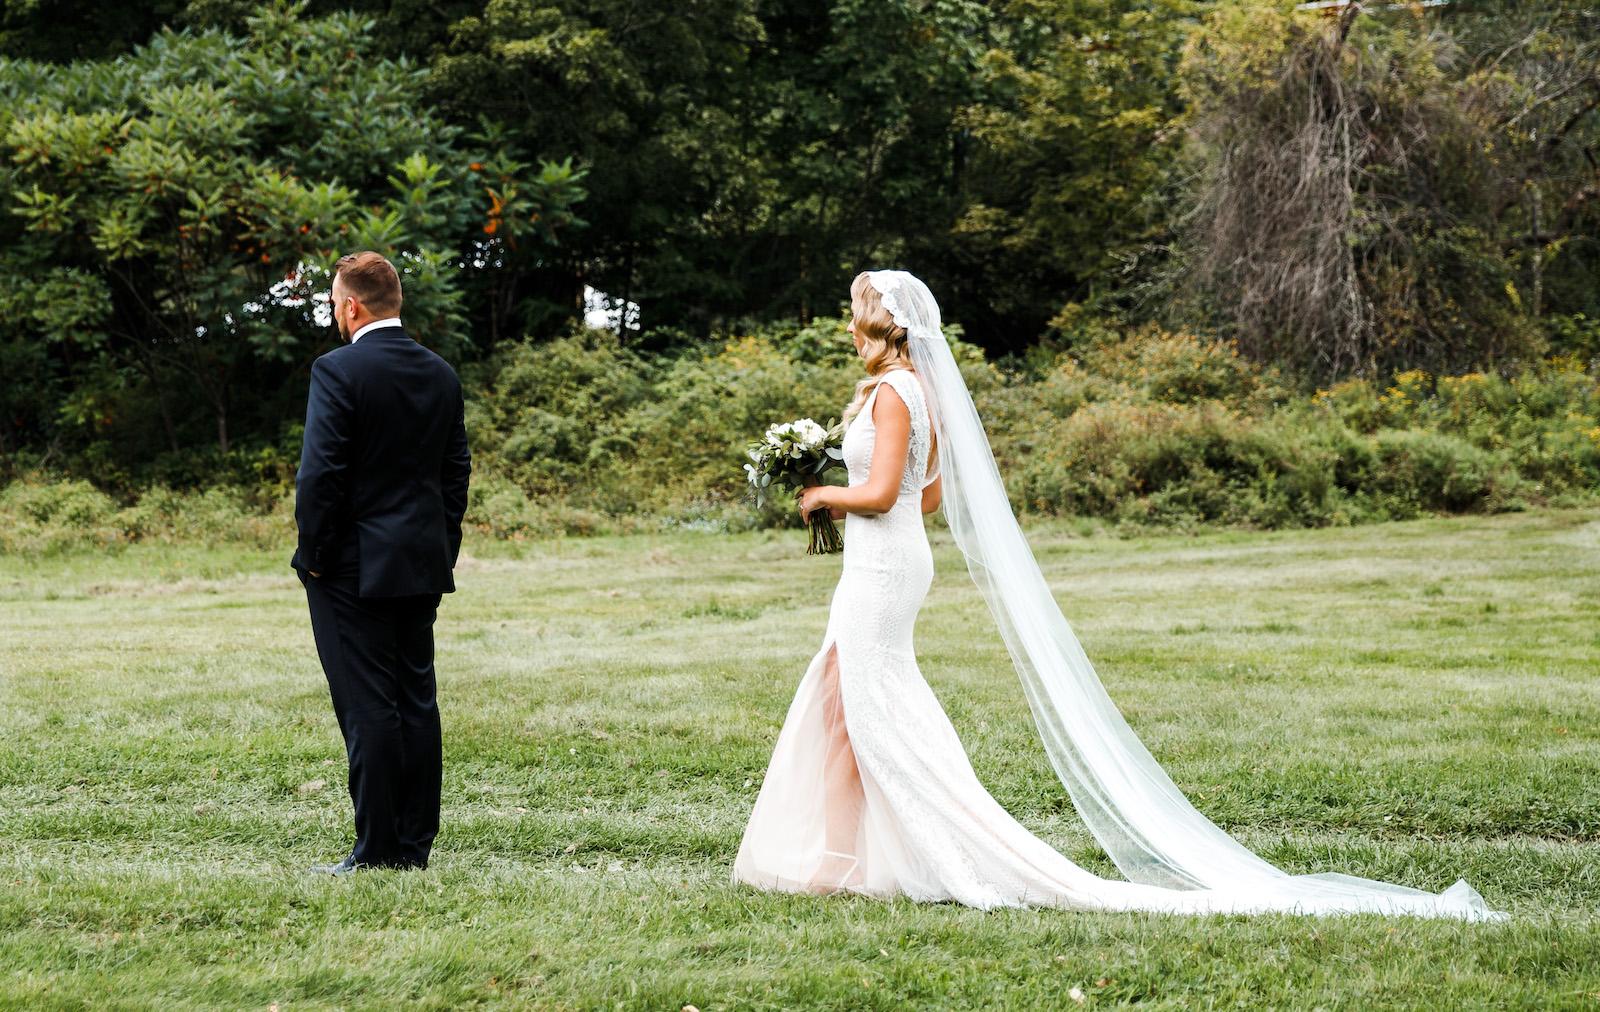 first-look-wedding-veil.jpg